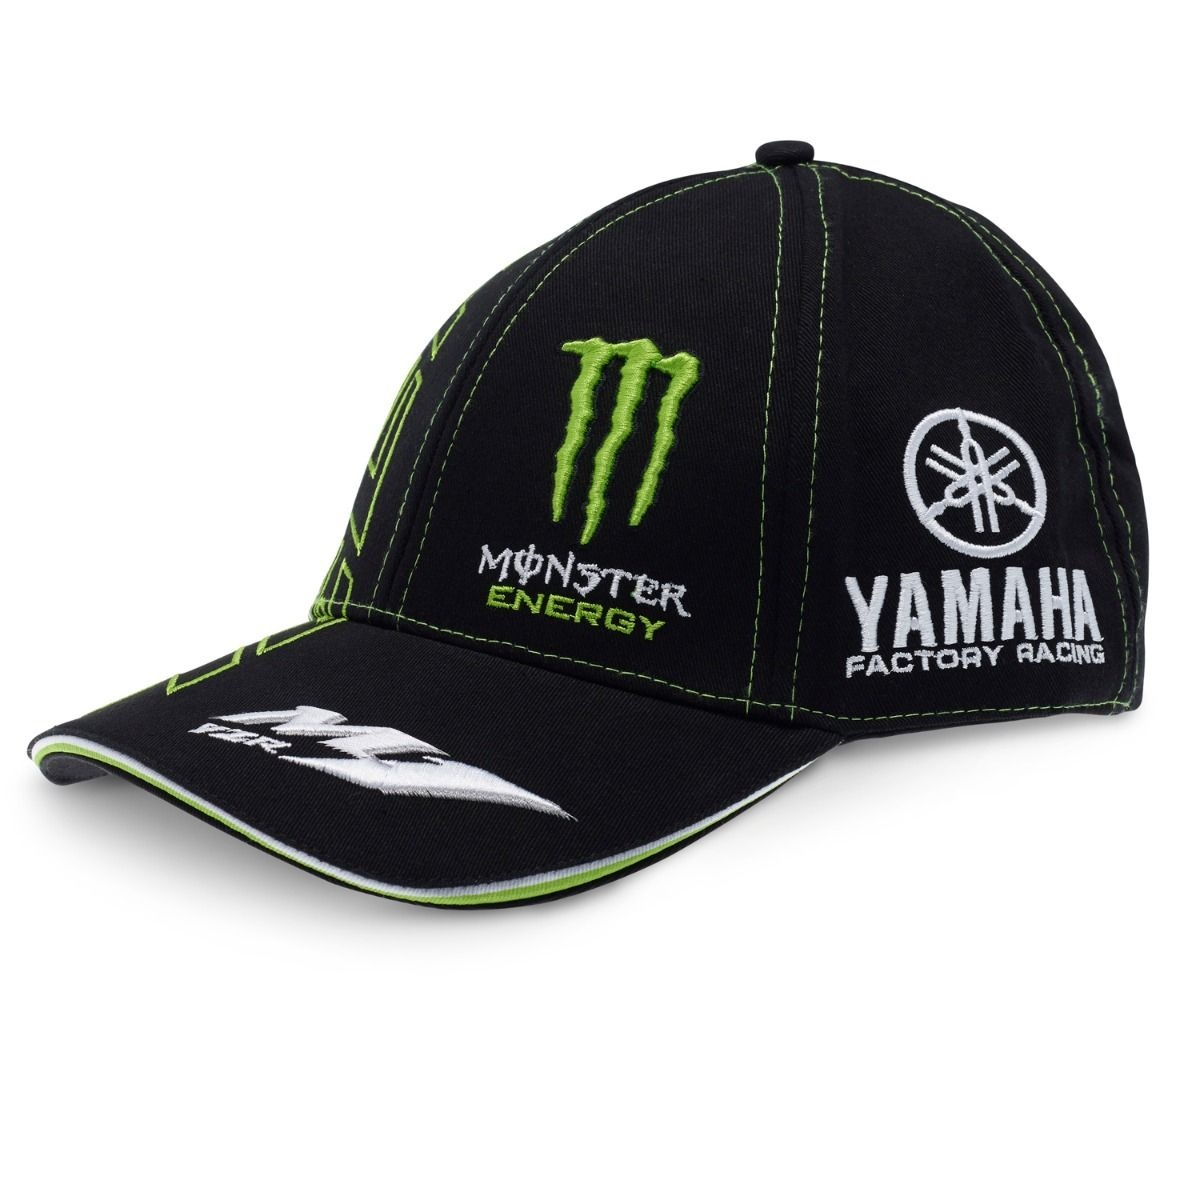 Details about CAP Hat Curved Peak Monster Energy Bike MotoGP Superbike  Yamaha Tech3 Black US b71f47c61c01